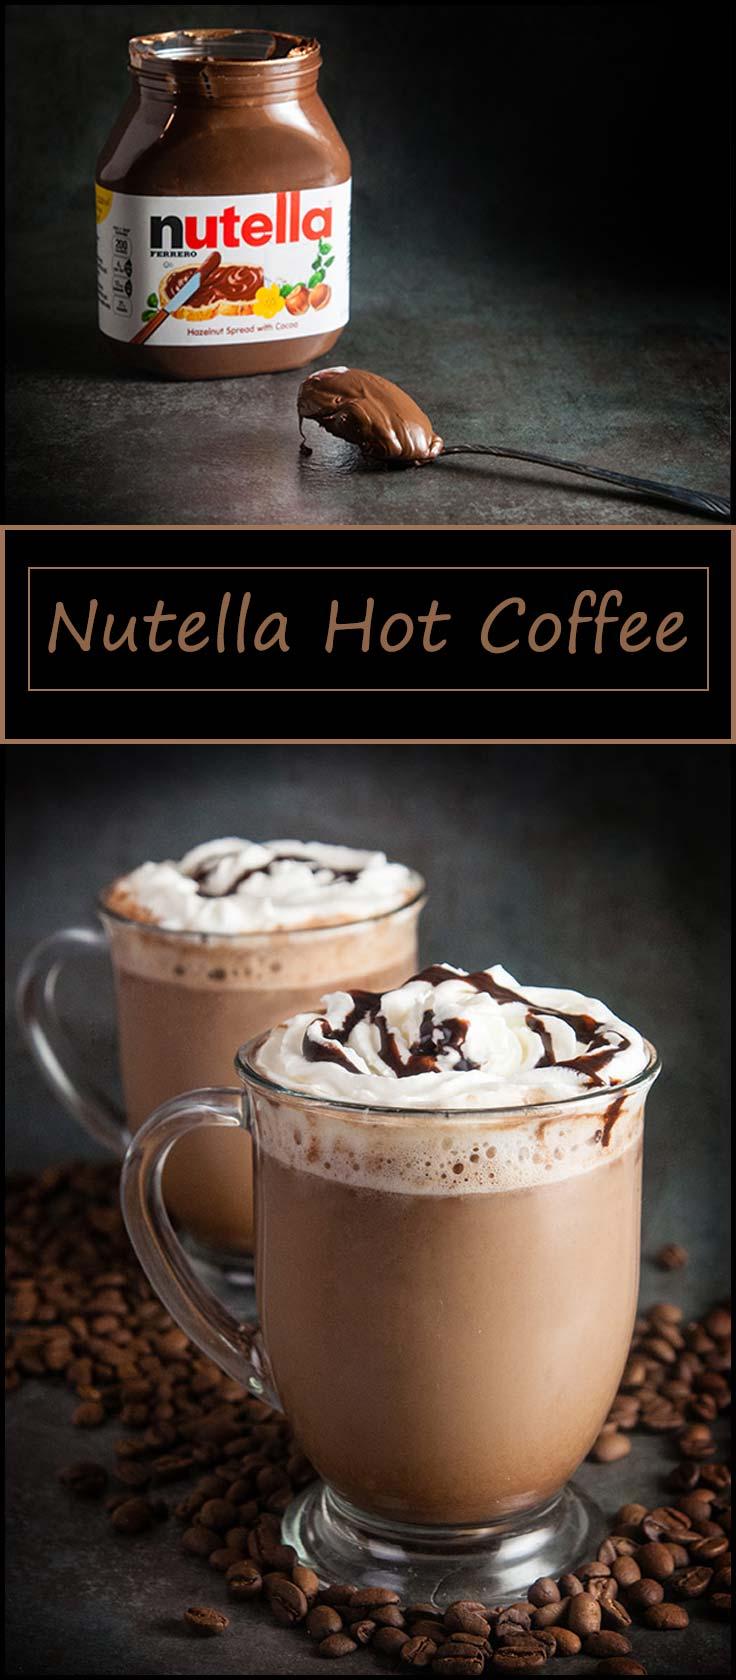 Nutella hot coffee from www.seasonedsprinkles.com